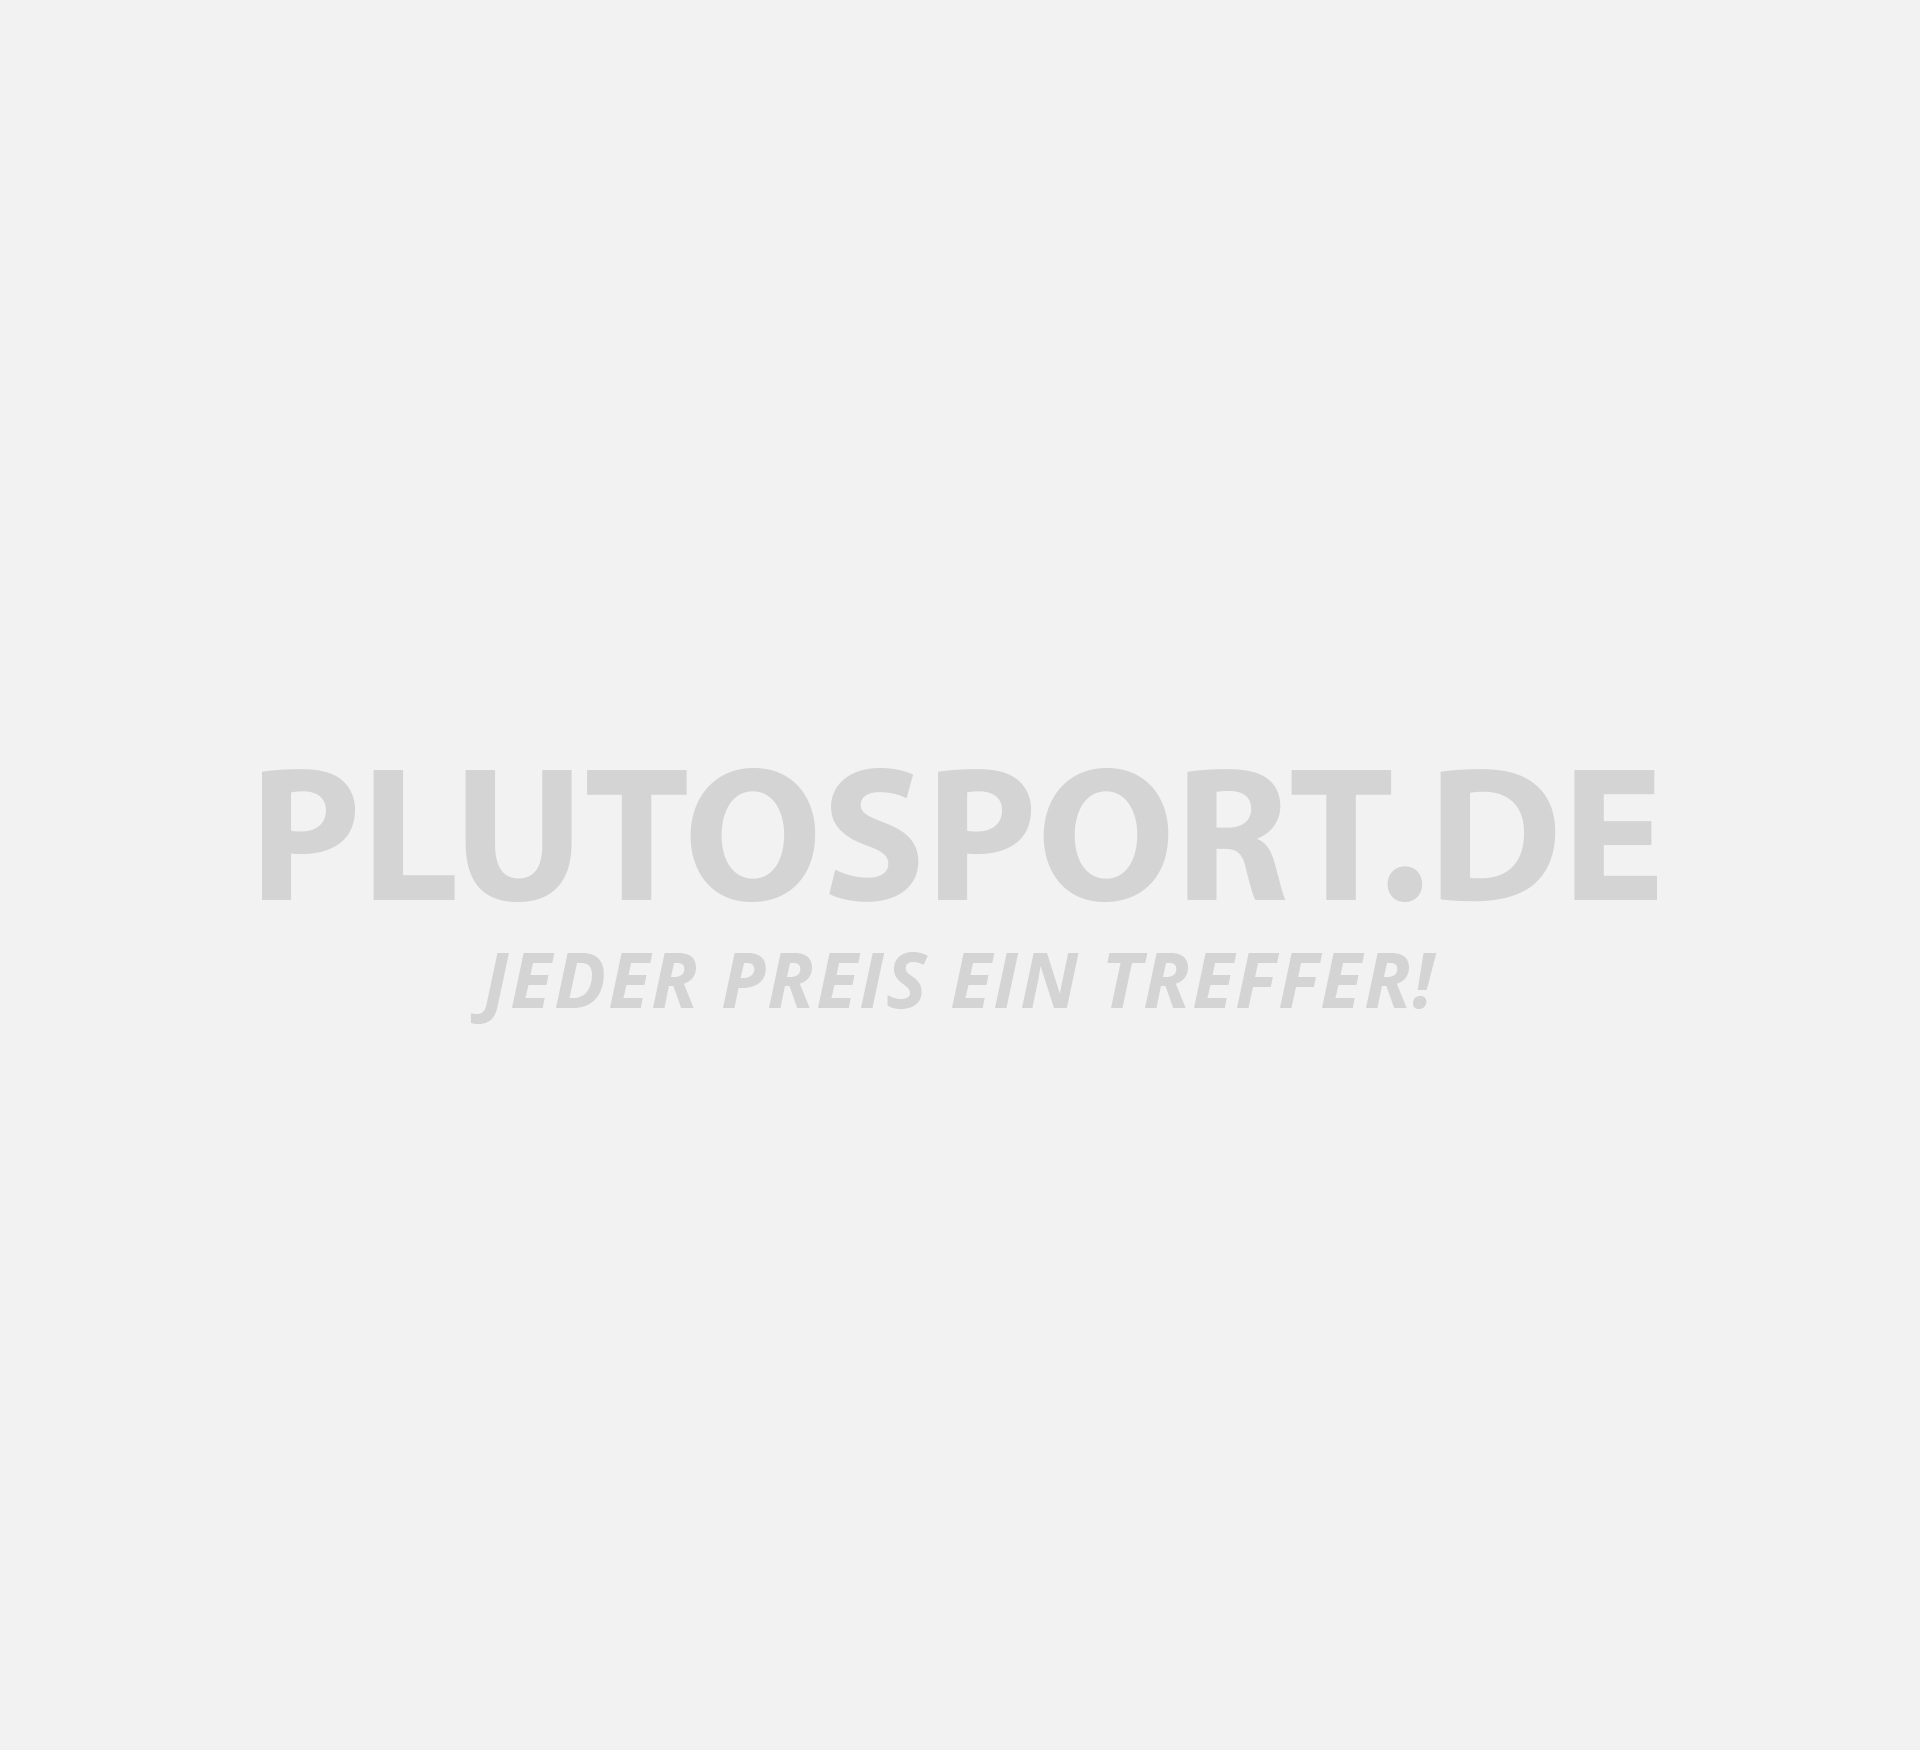 Nike Sphere 3.0 Laufsportschuh Damen